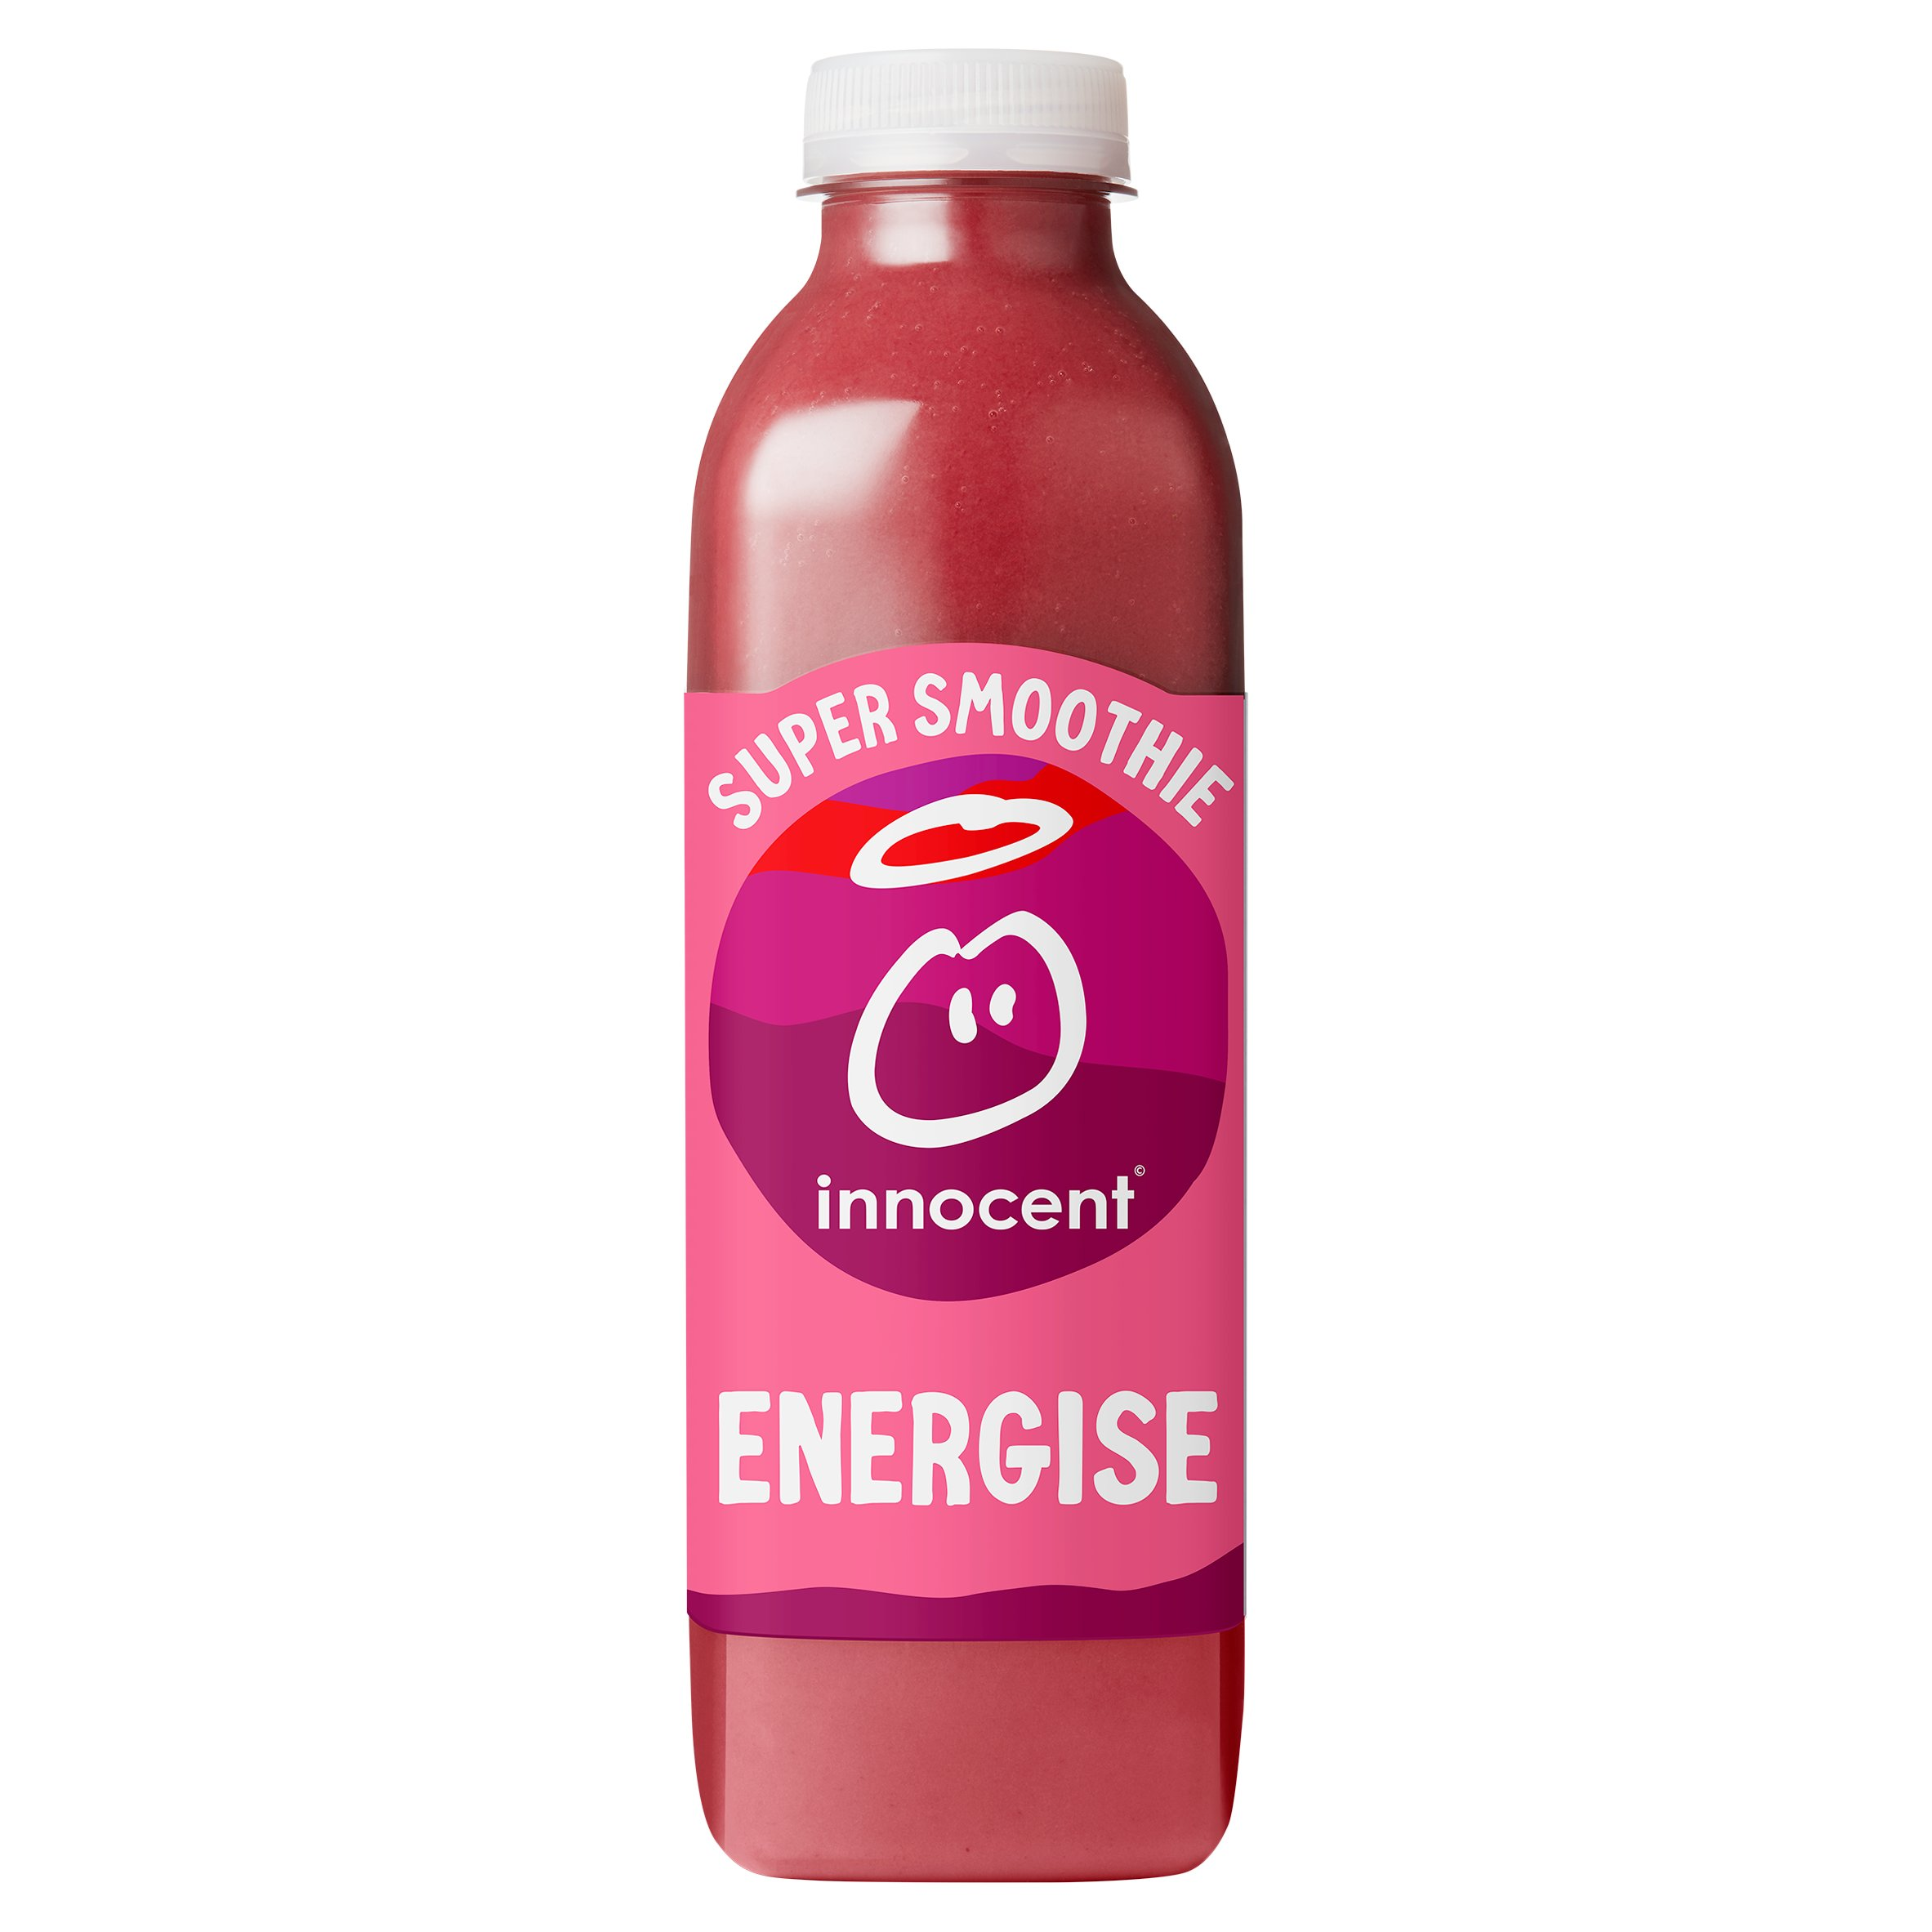 Innocent Energise Super Smoothie 750Ml